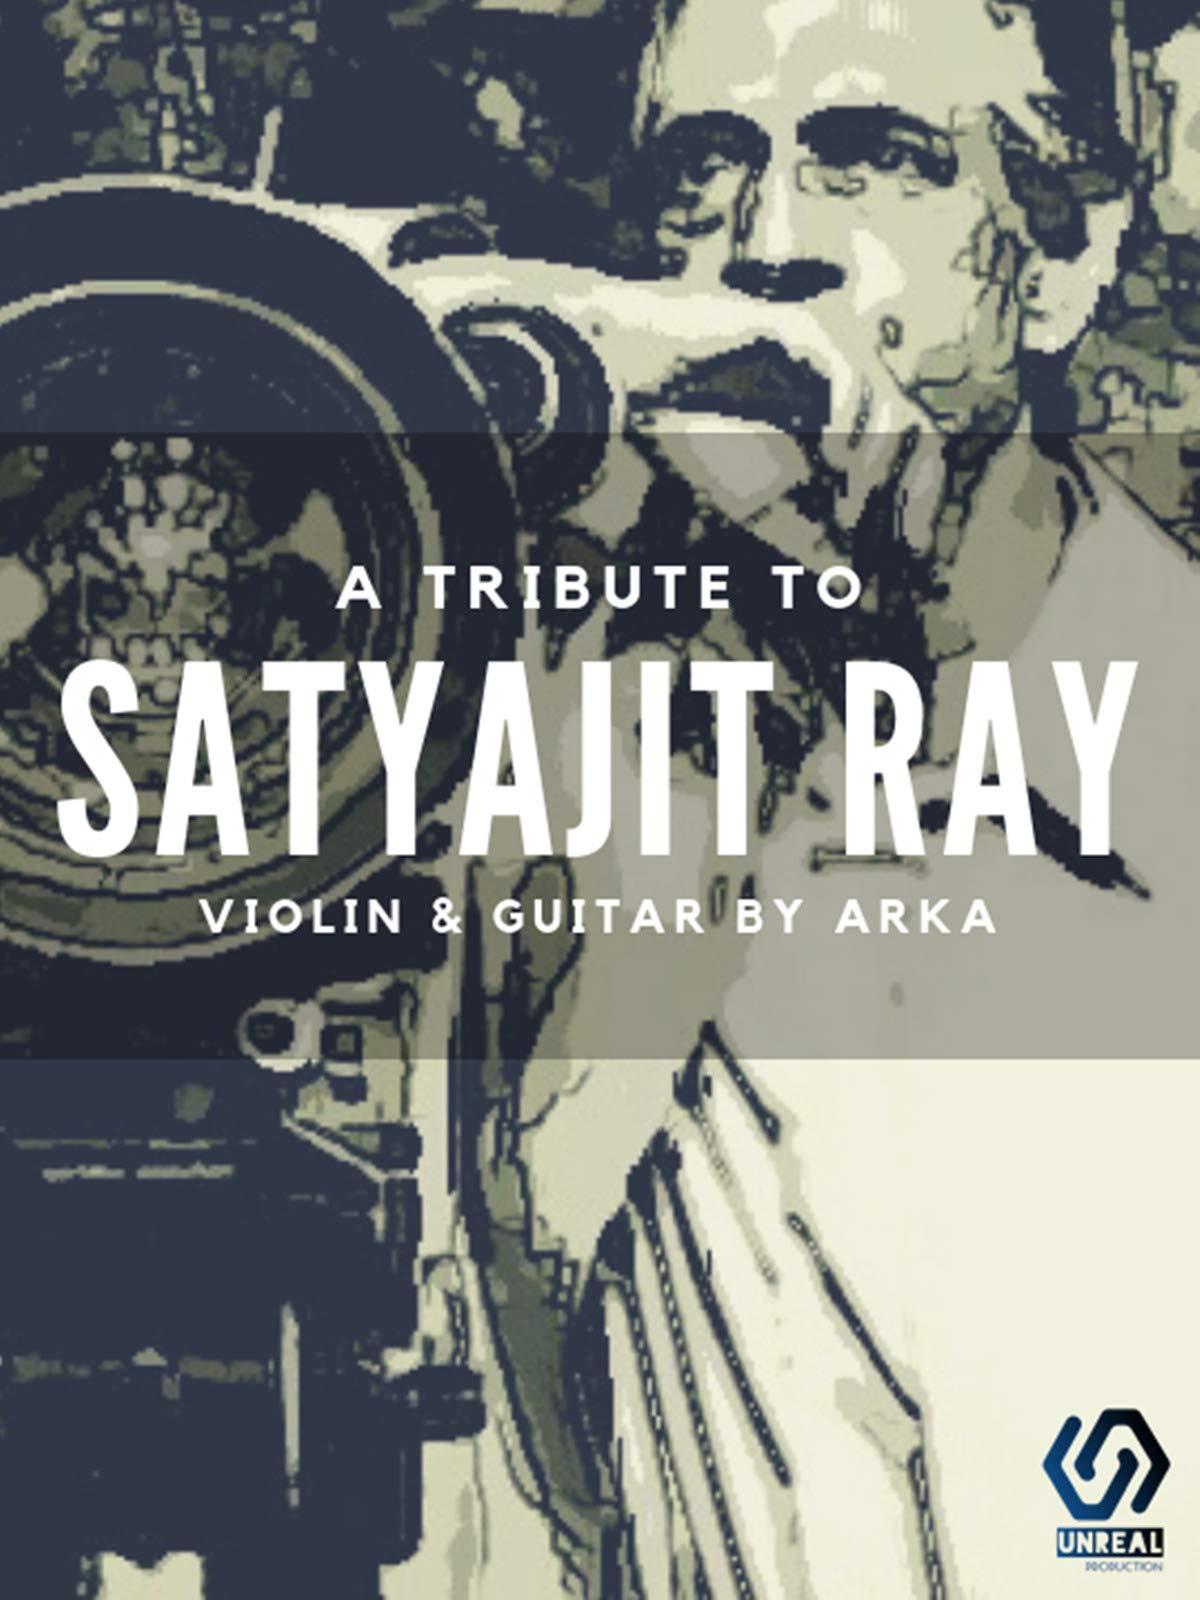 Tribute To Satyajit Ray - Violin & Guitar By Arka Bhattyacharya